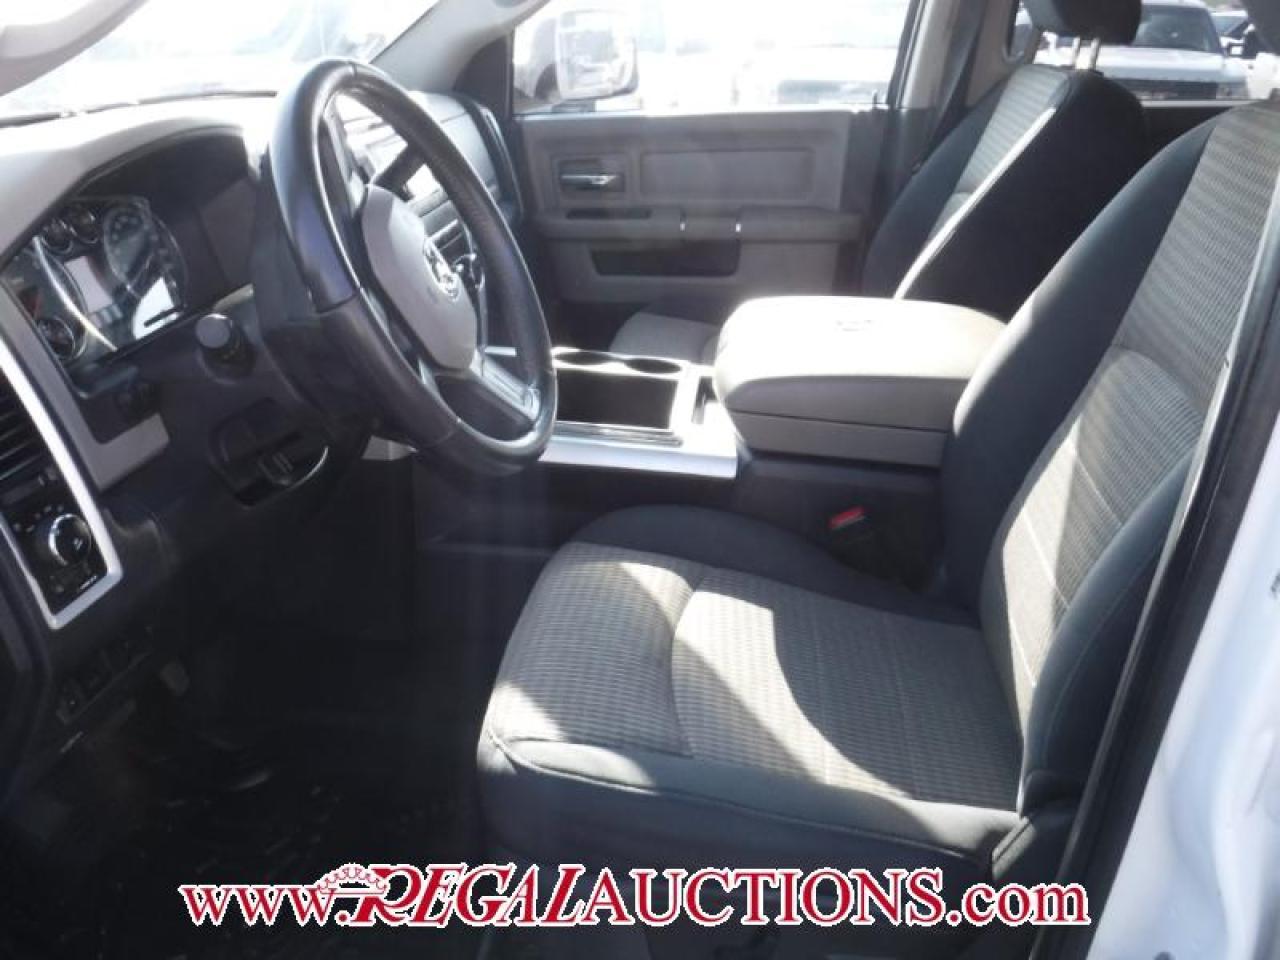 2010 Dodge RAM 2500 SLT CREW CAB 4WD